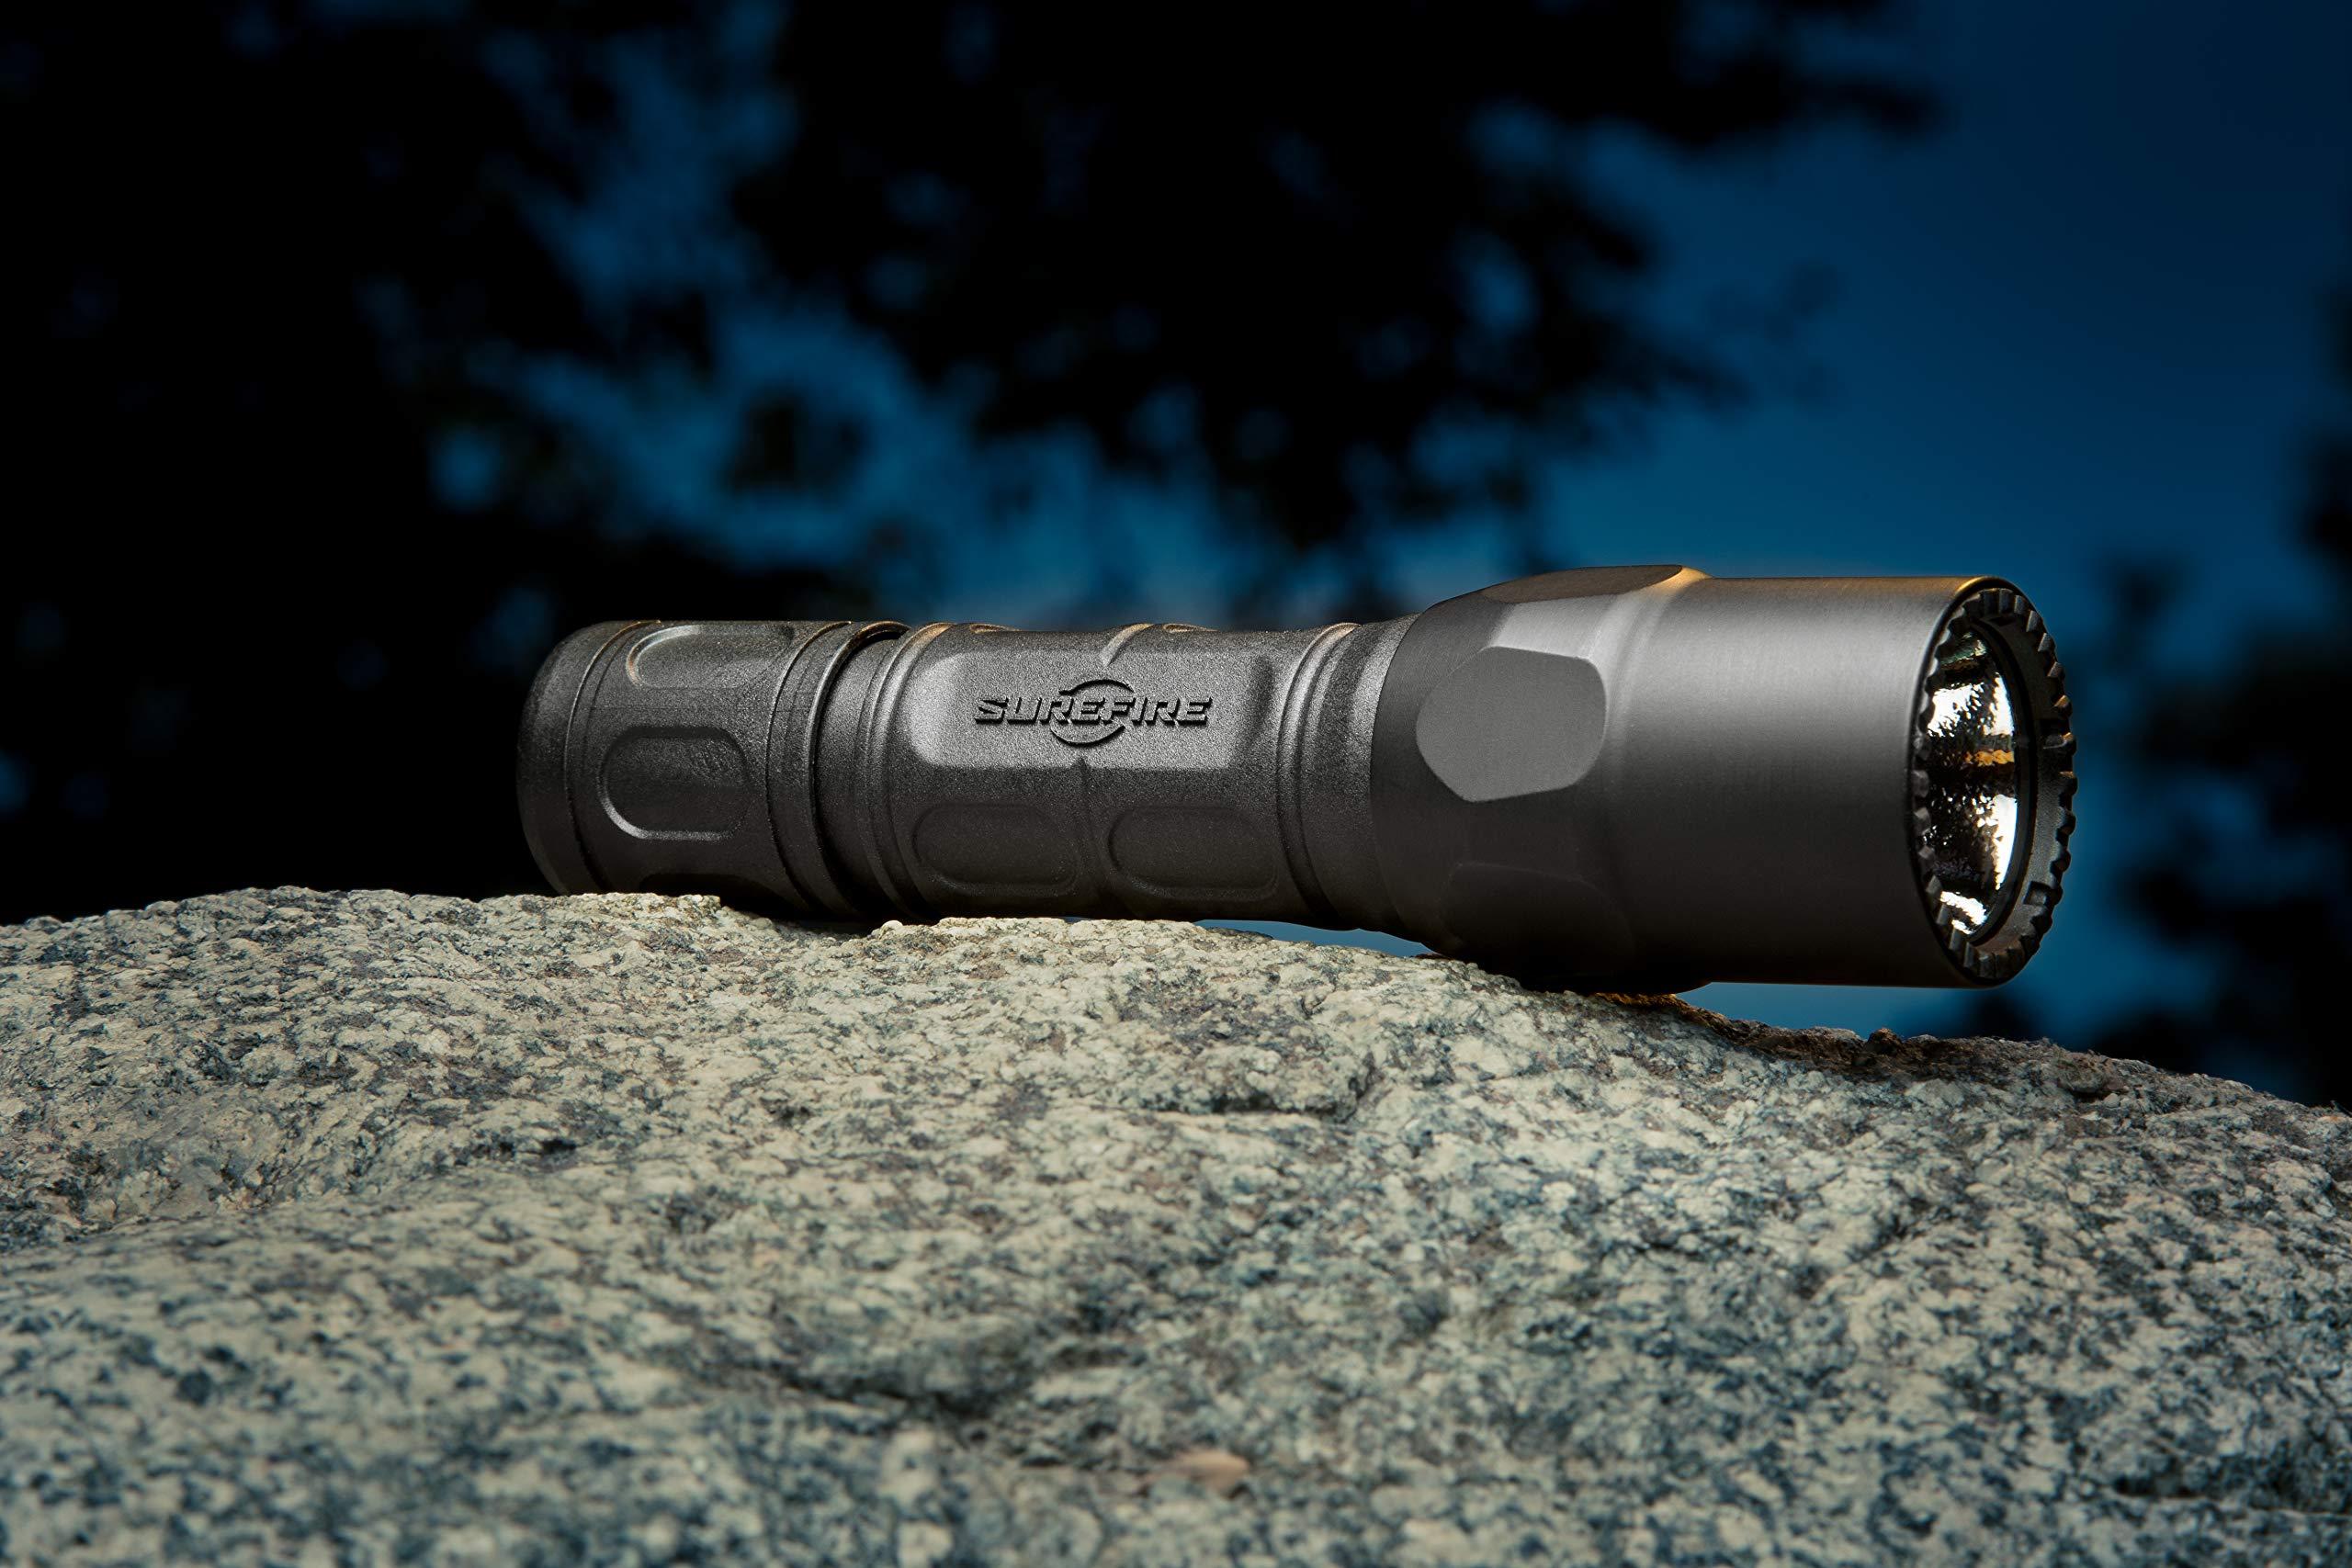 SureFire G2X Pro Dual-Output LED Flashlight with Click Switch, Black by SureFire (Image #4)